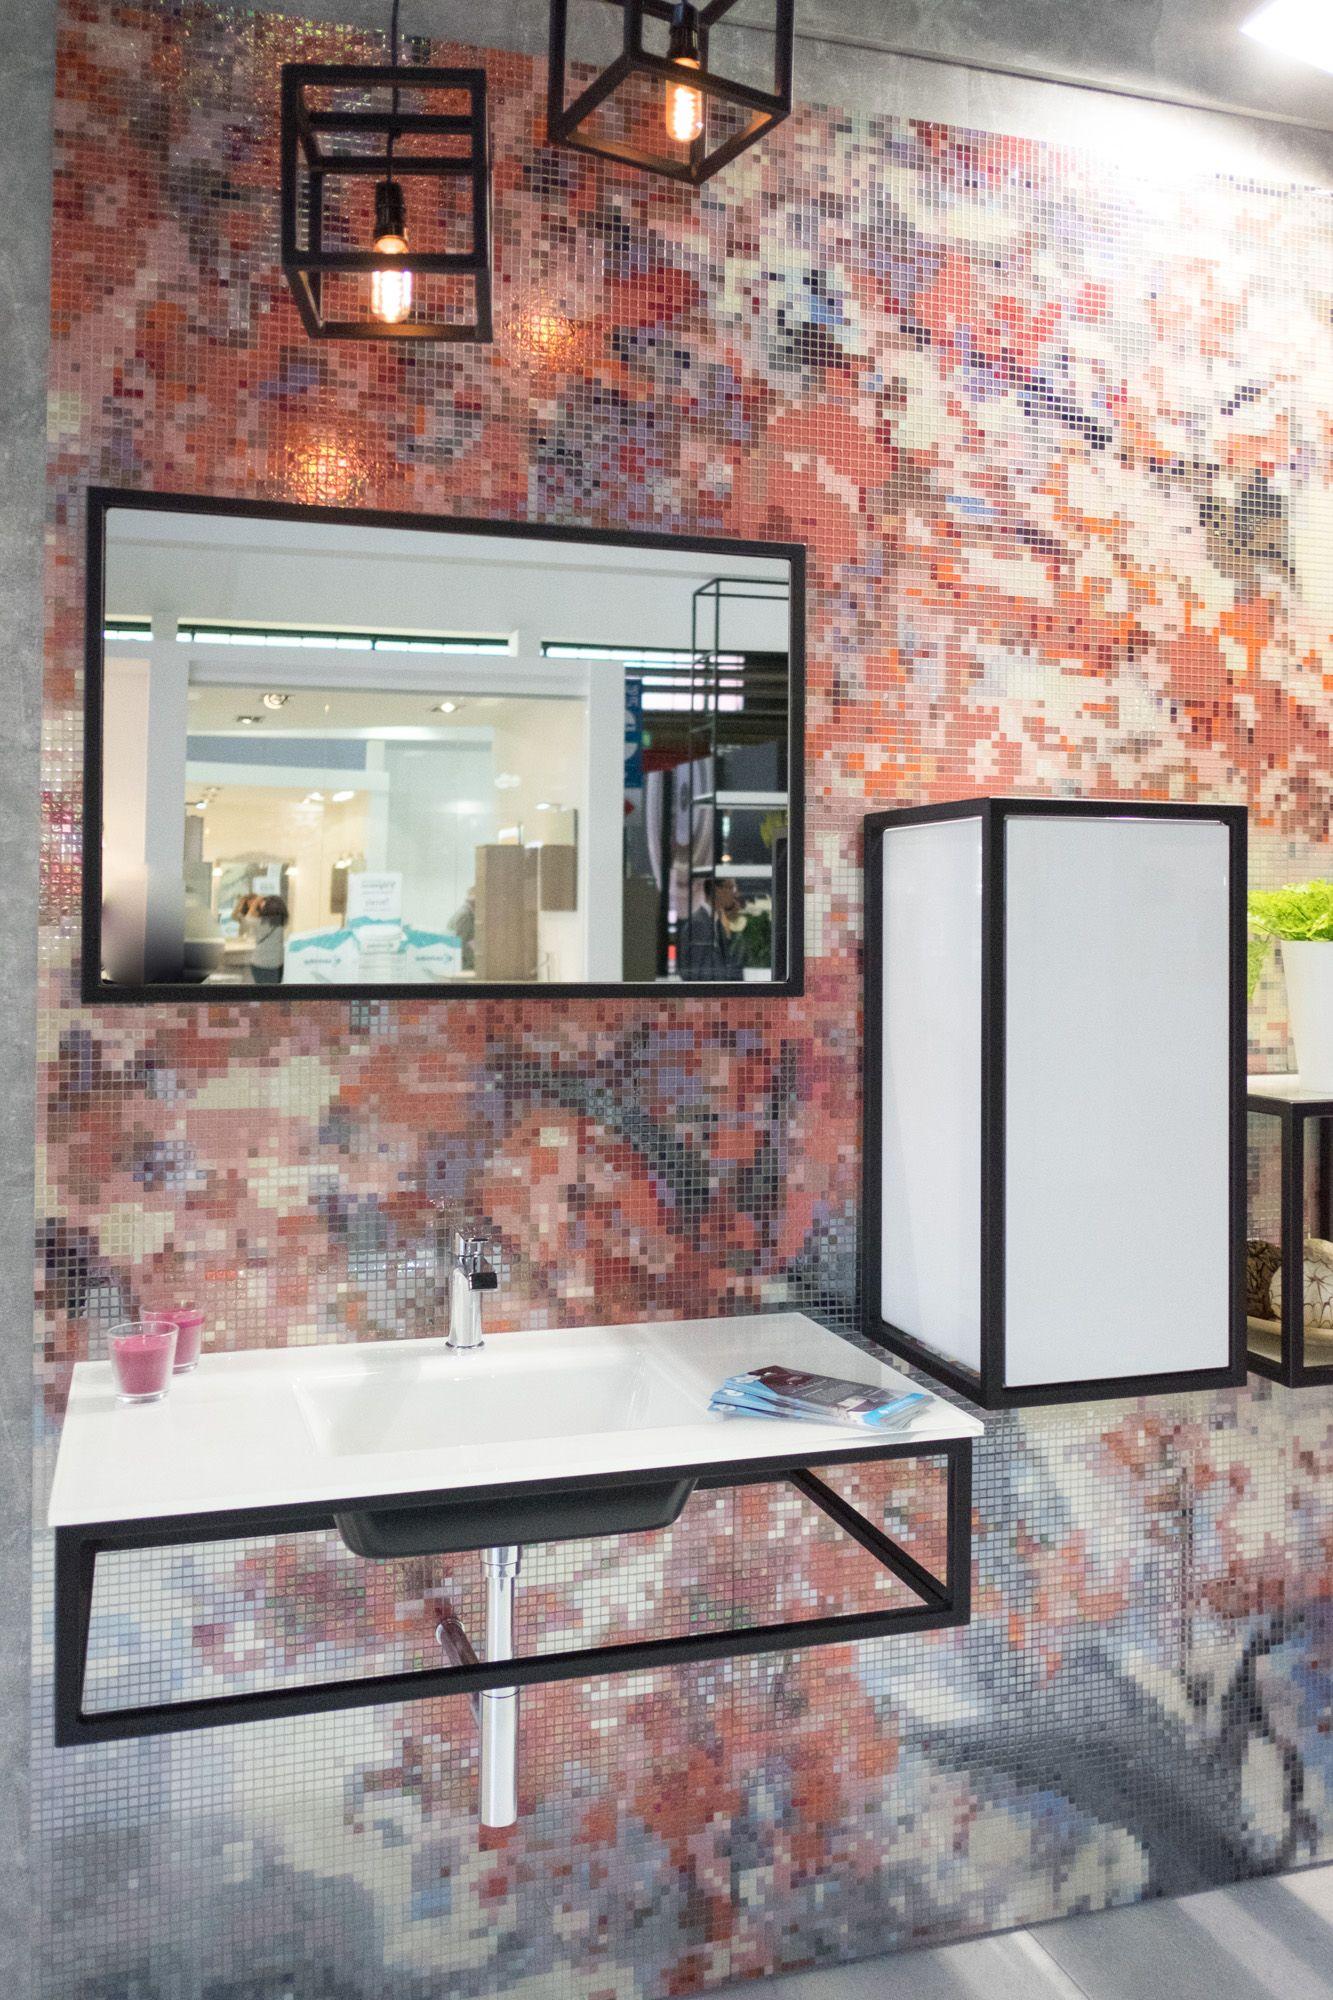 Amazing ideas for dreamy bathroom tile designs for Carrelage salle de bain tendance 2017